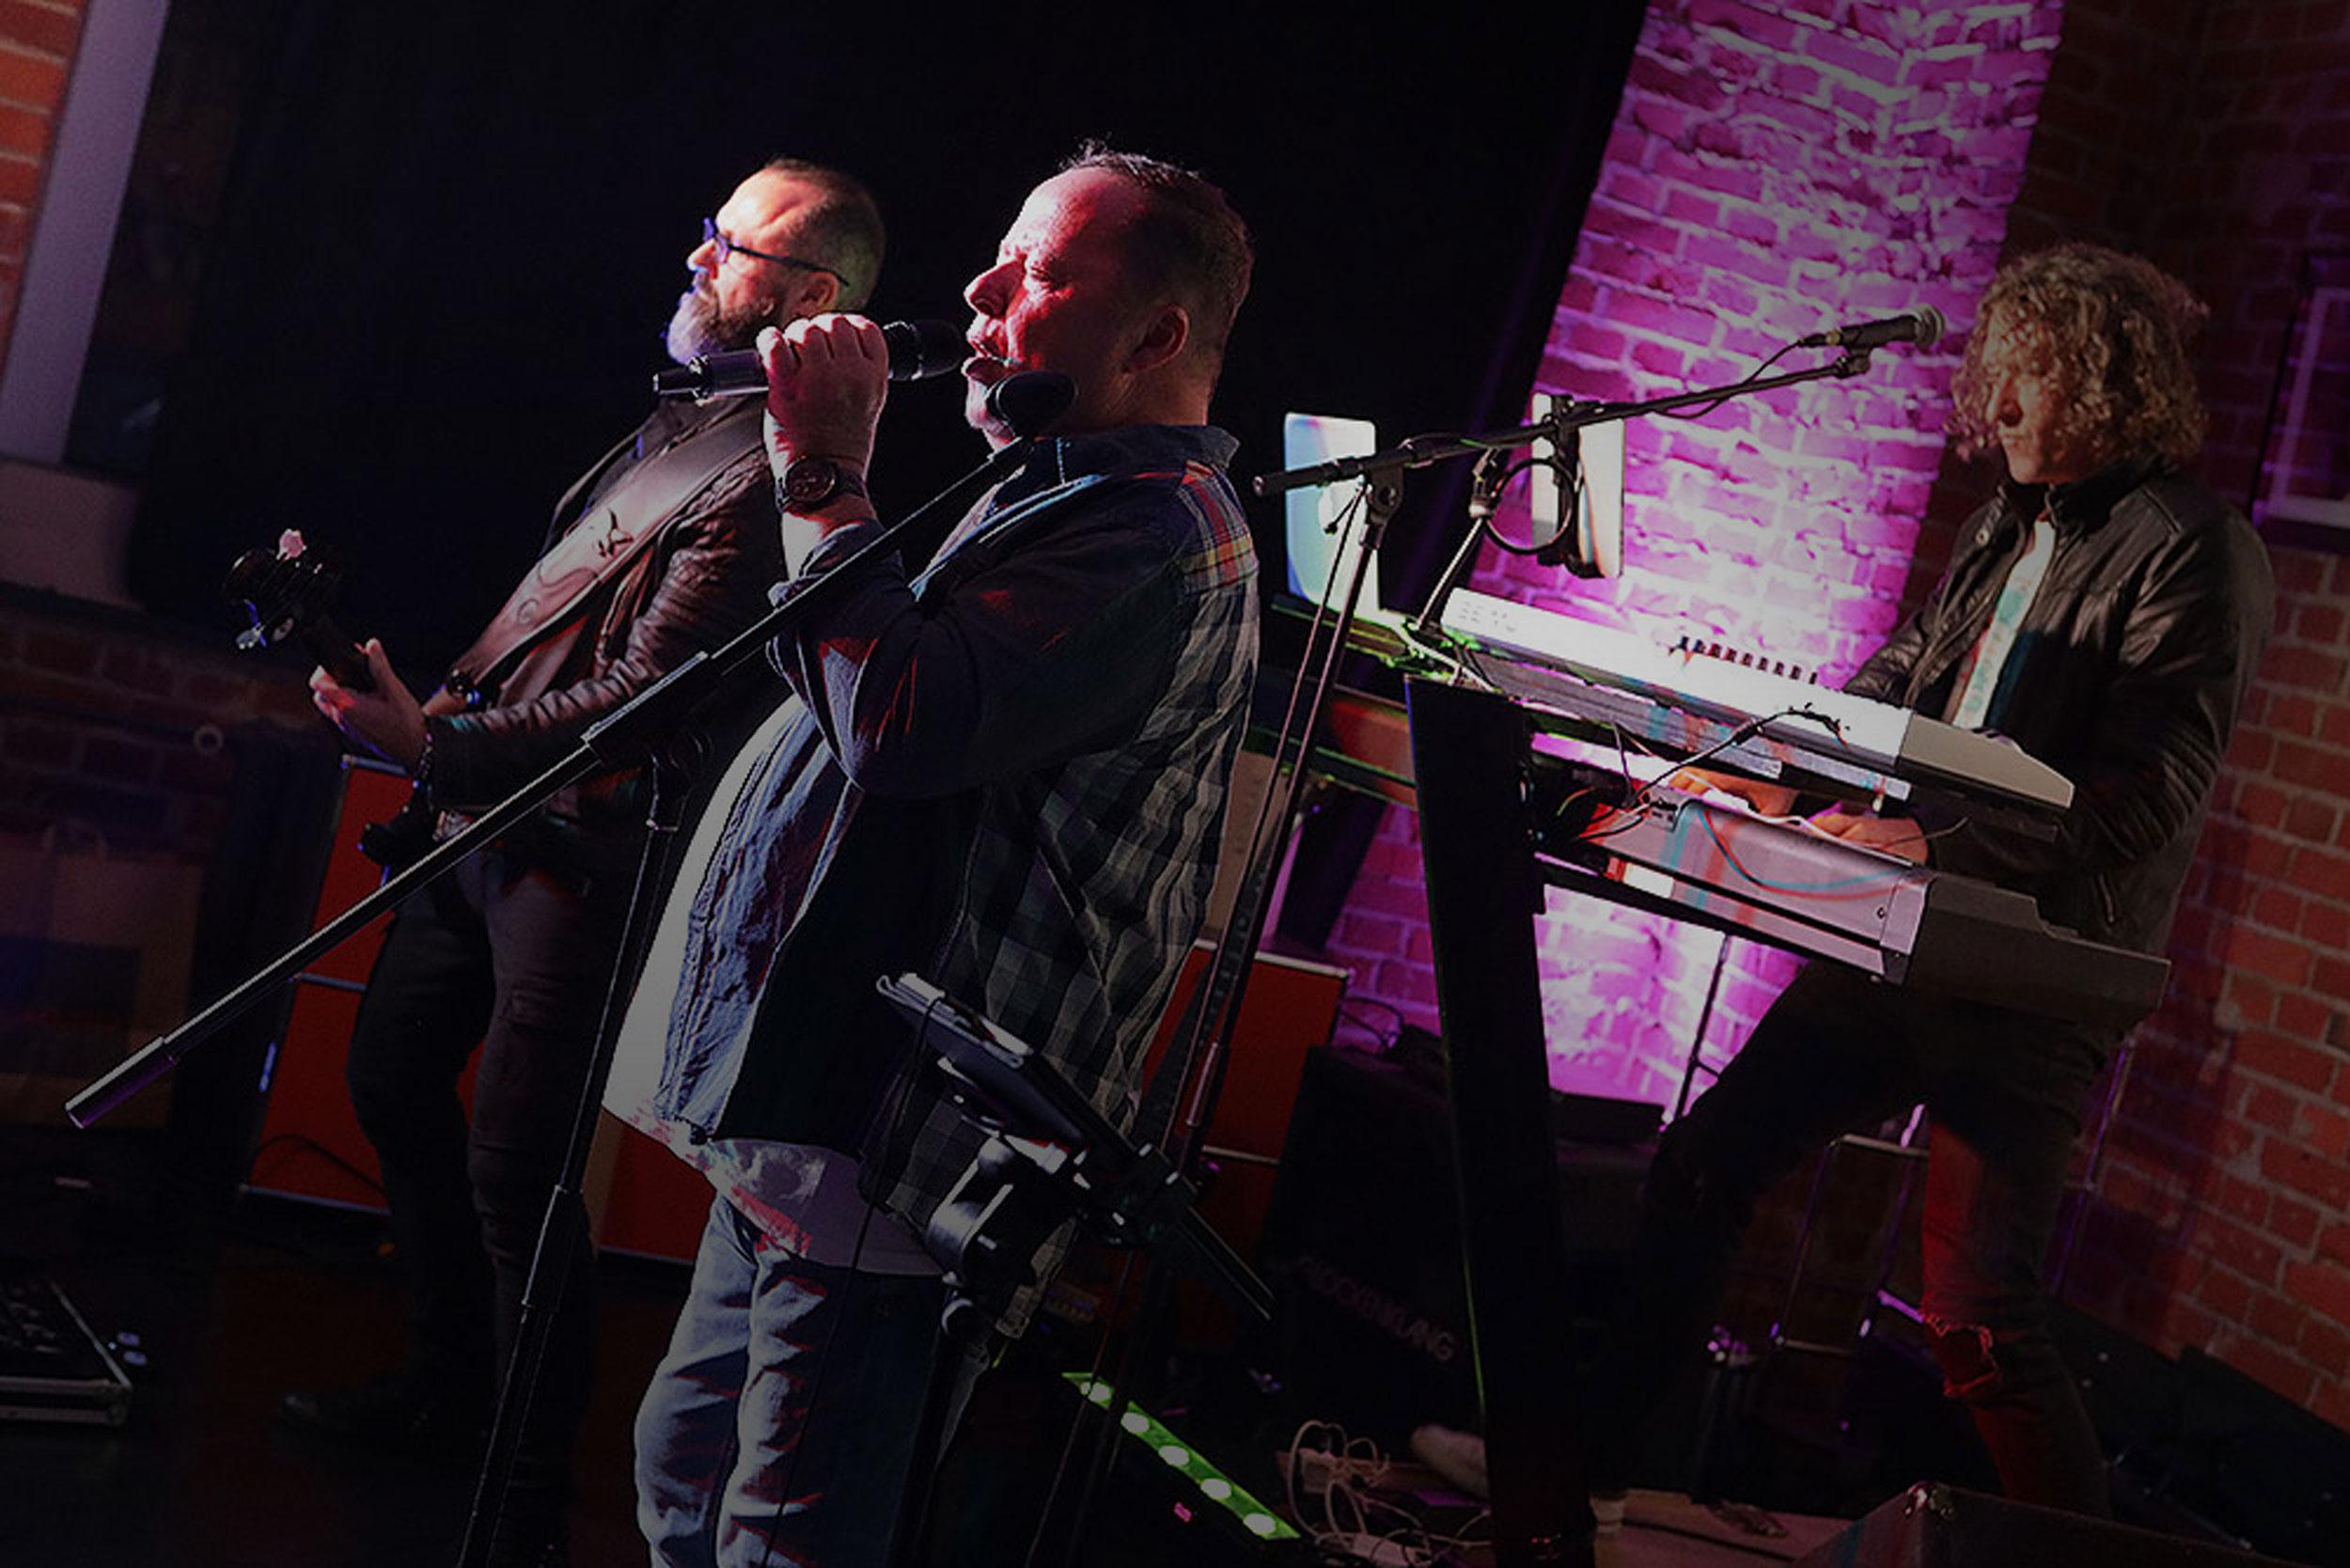 Arno feiert mit Livemusik